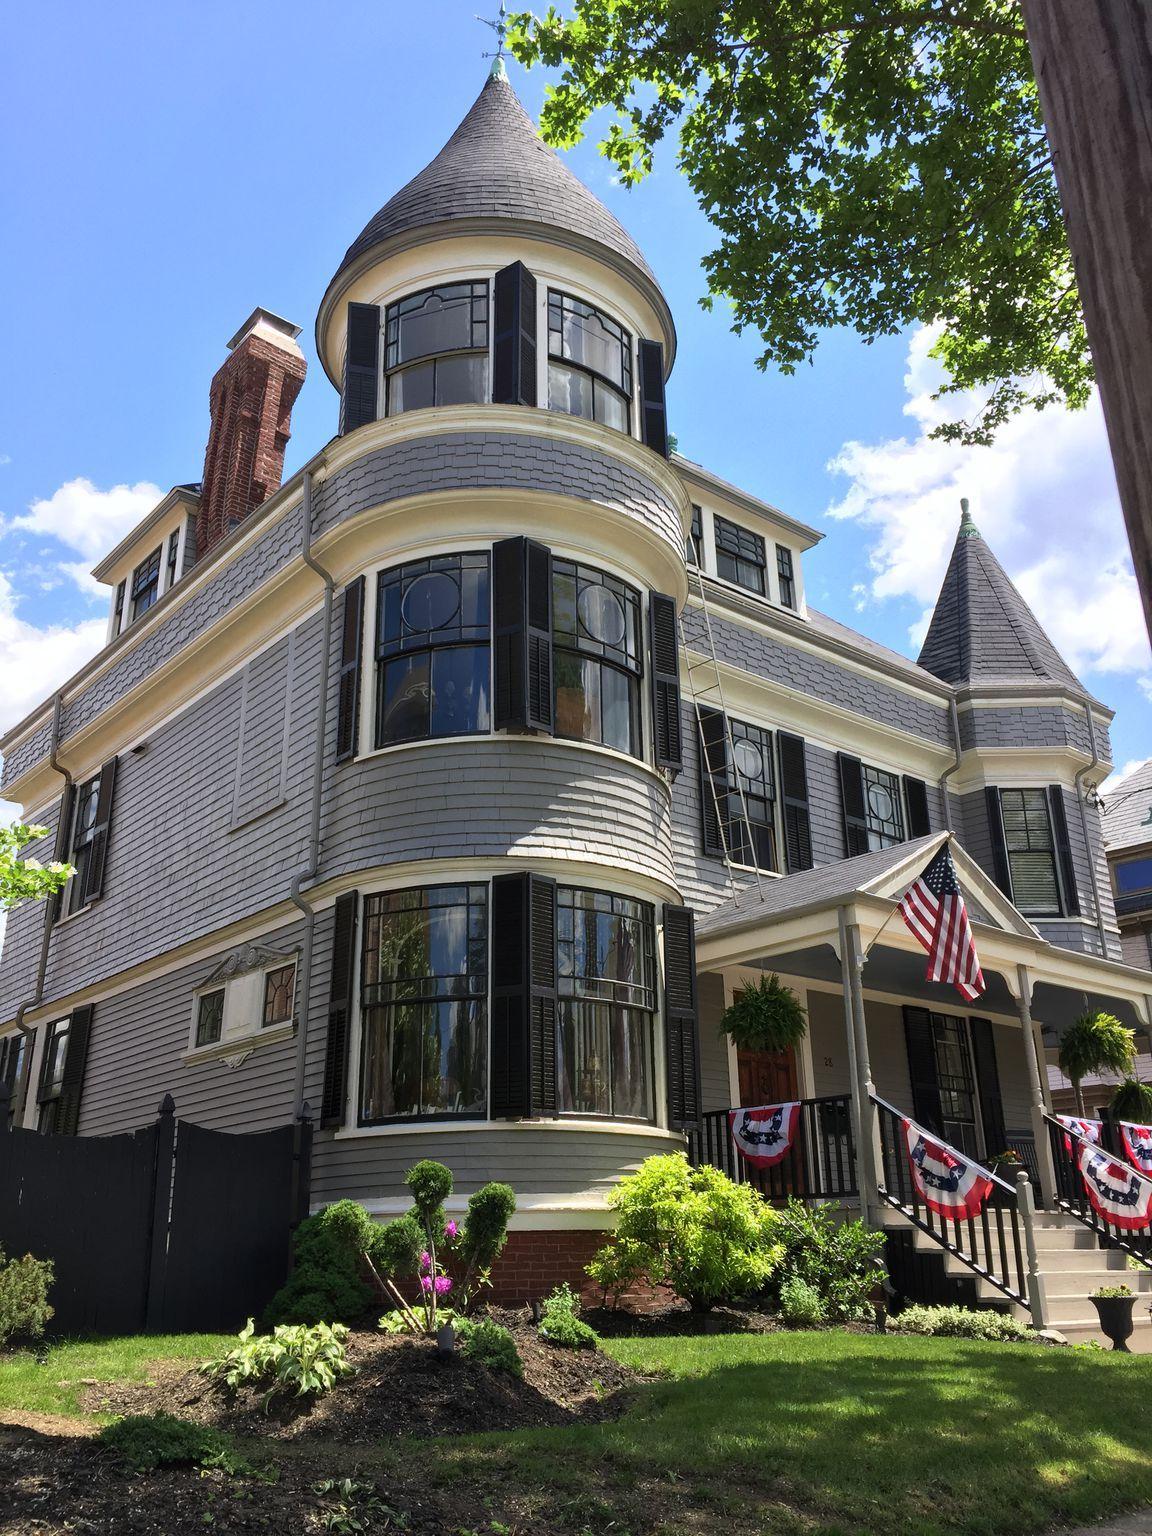 28 Atlantic St Victorian Architecture Architecture Victorian Style Homes